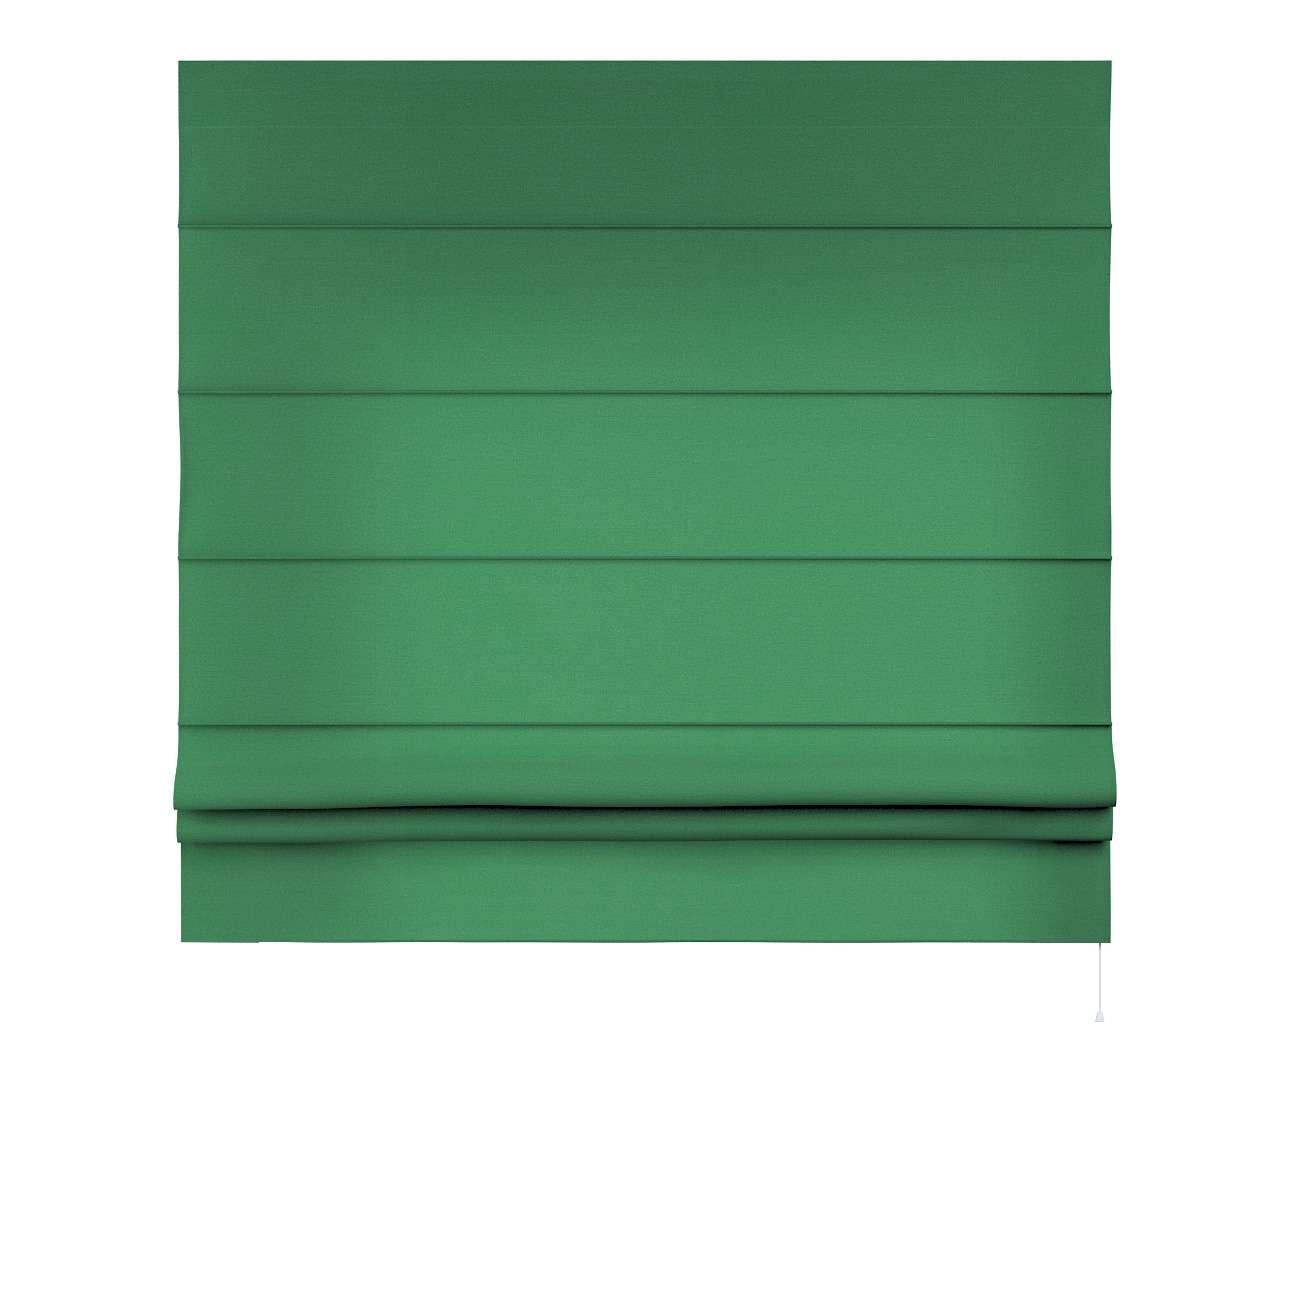 vouwgordijn Padva 80 x 170 cm van de collectie Loneta, Stof: 133-18